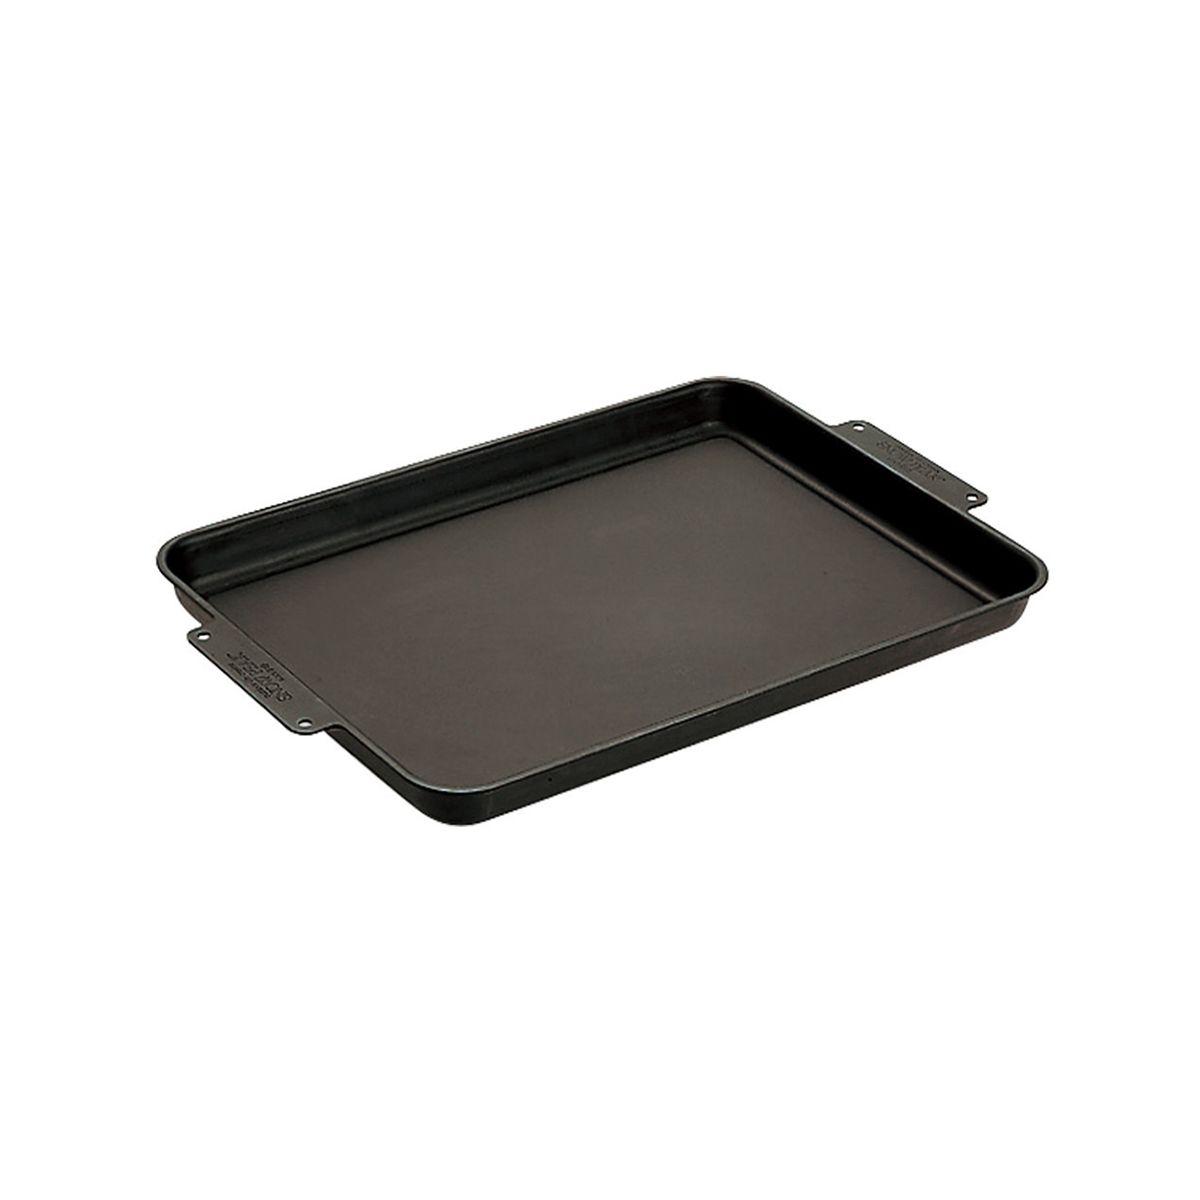 Snow Peak Iron Grill Plate